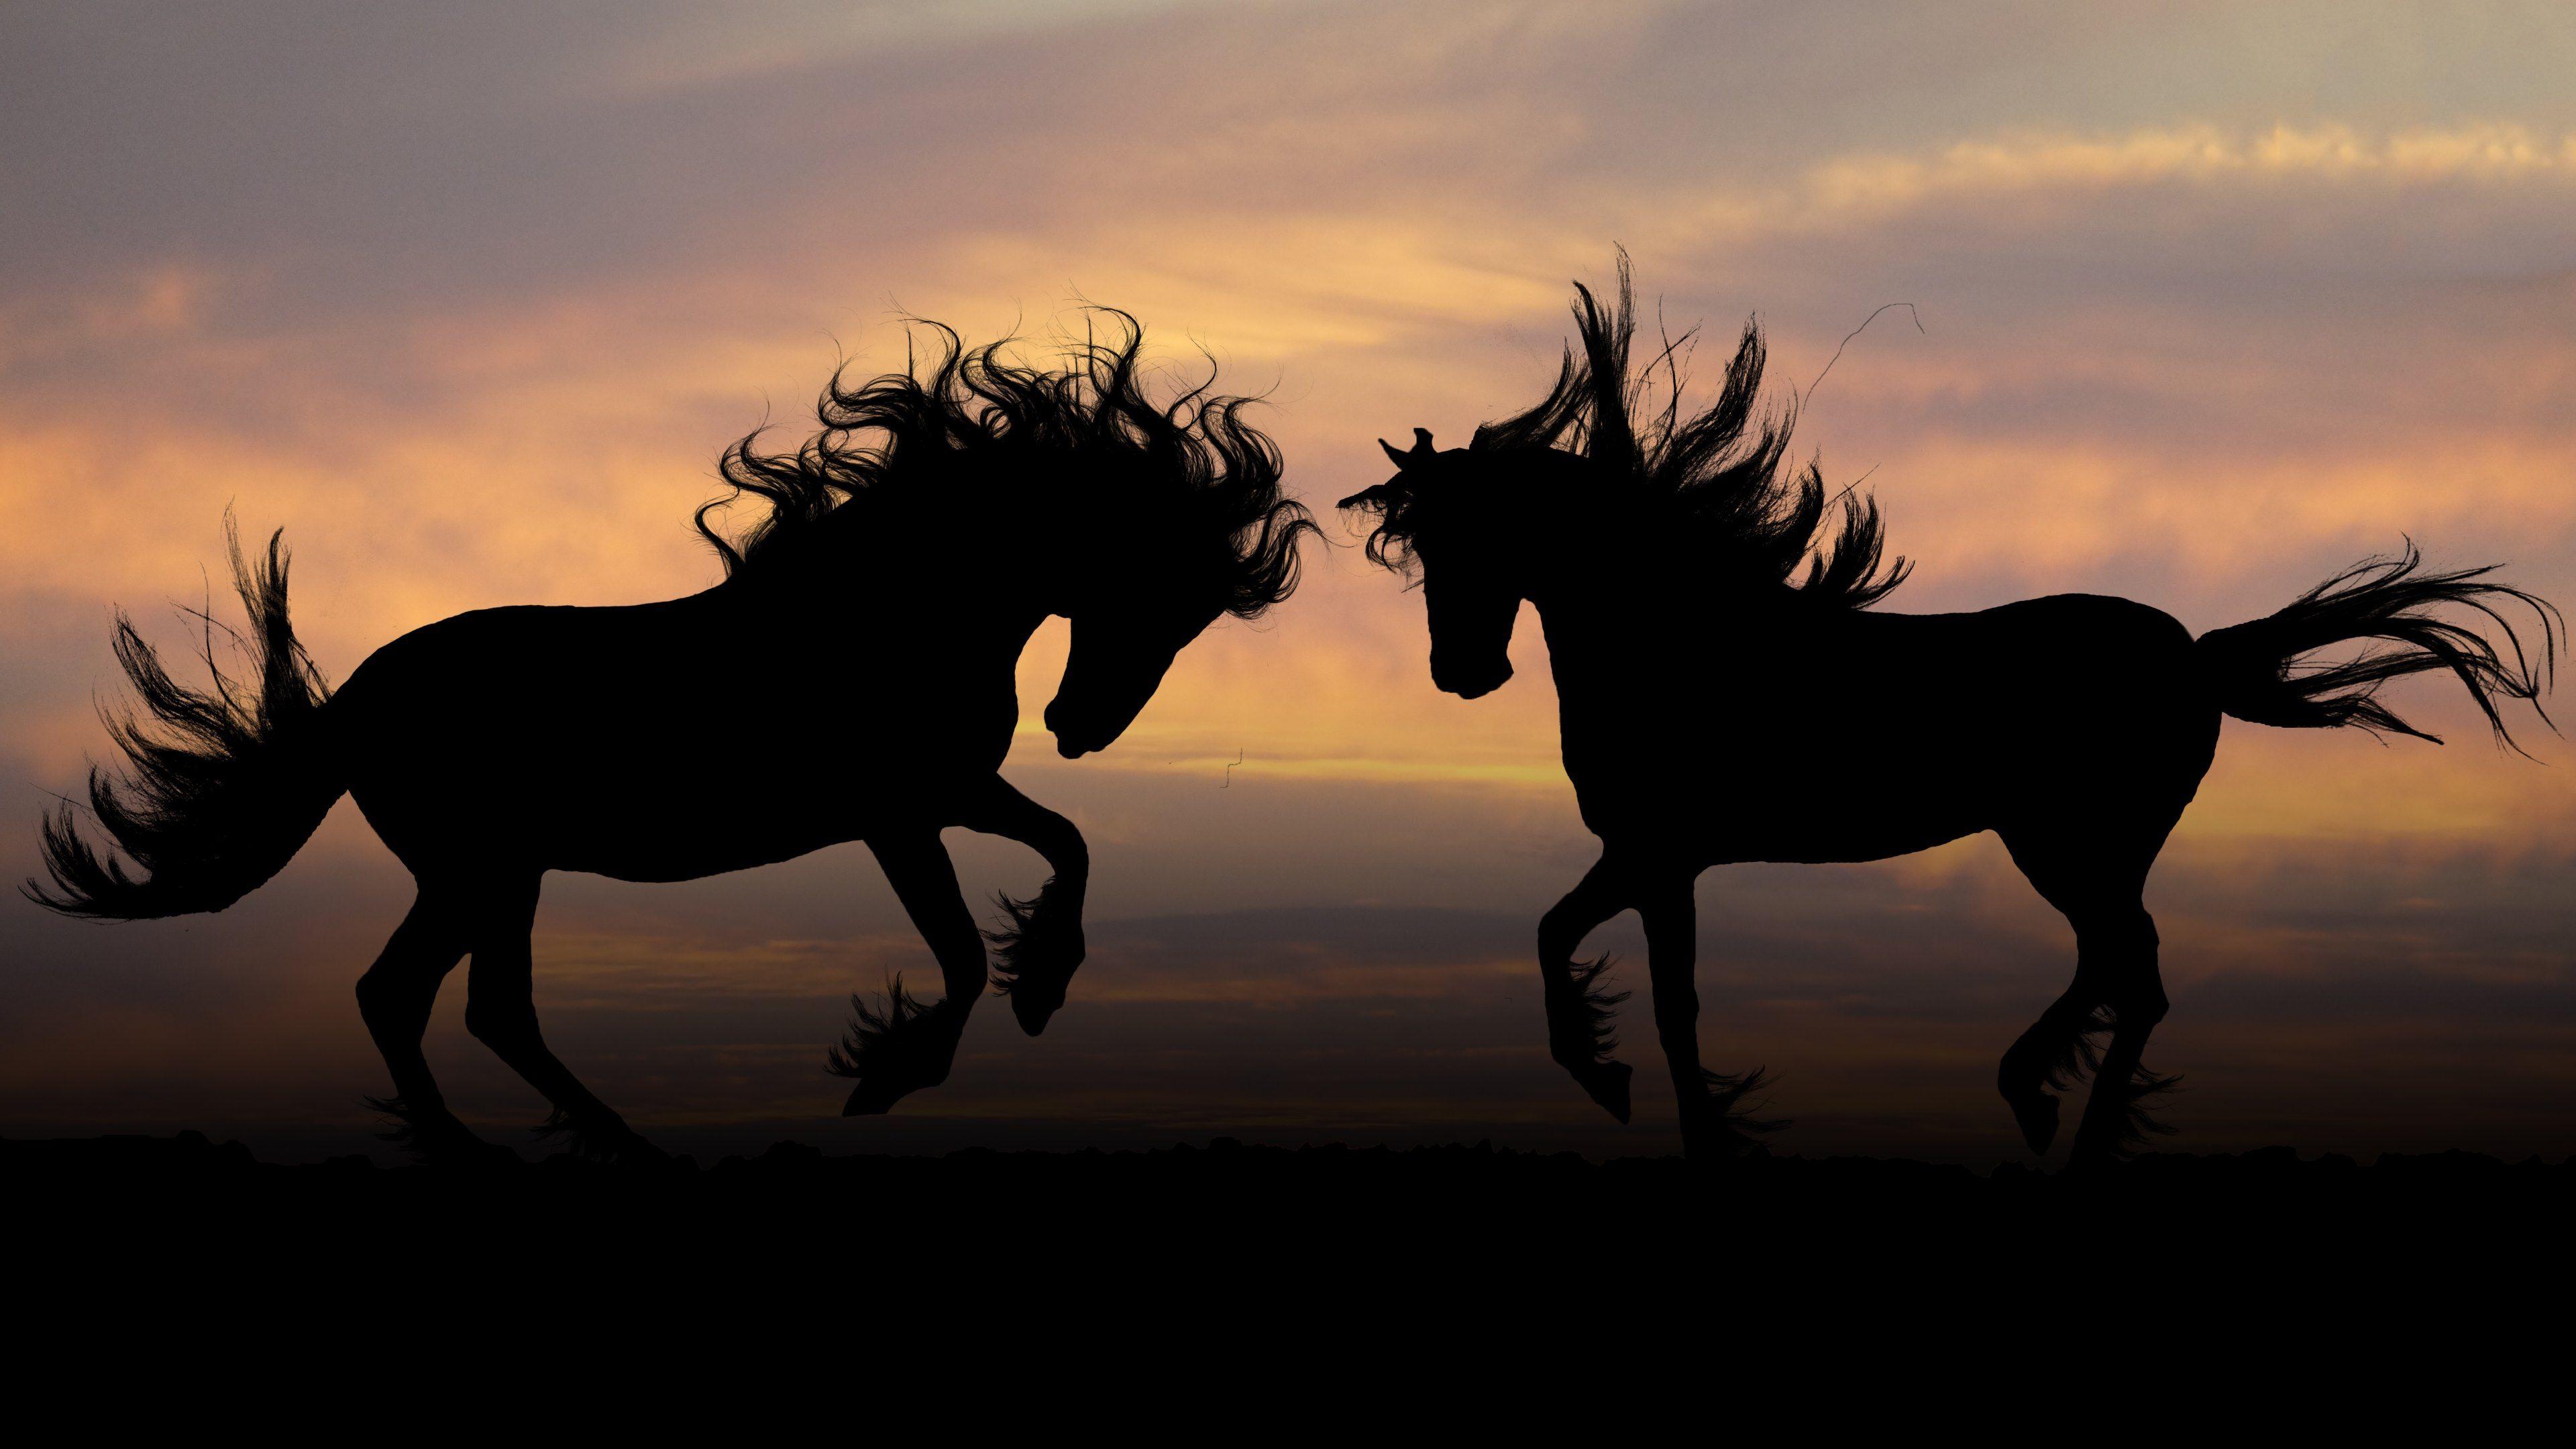 Horse 4k Ultra Hd Wallpaper Horse Silhouettes Hd Wallpapers 4k Wallpapers